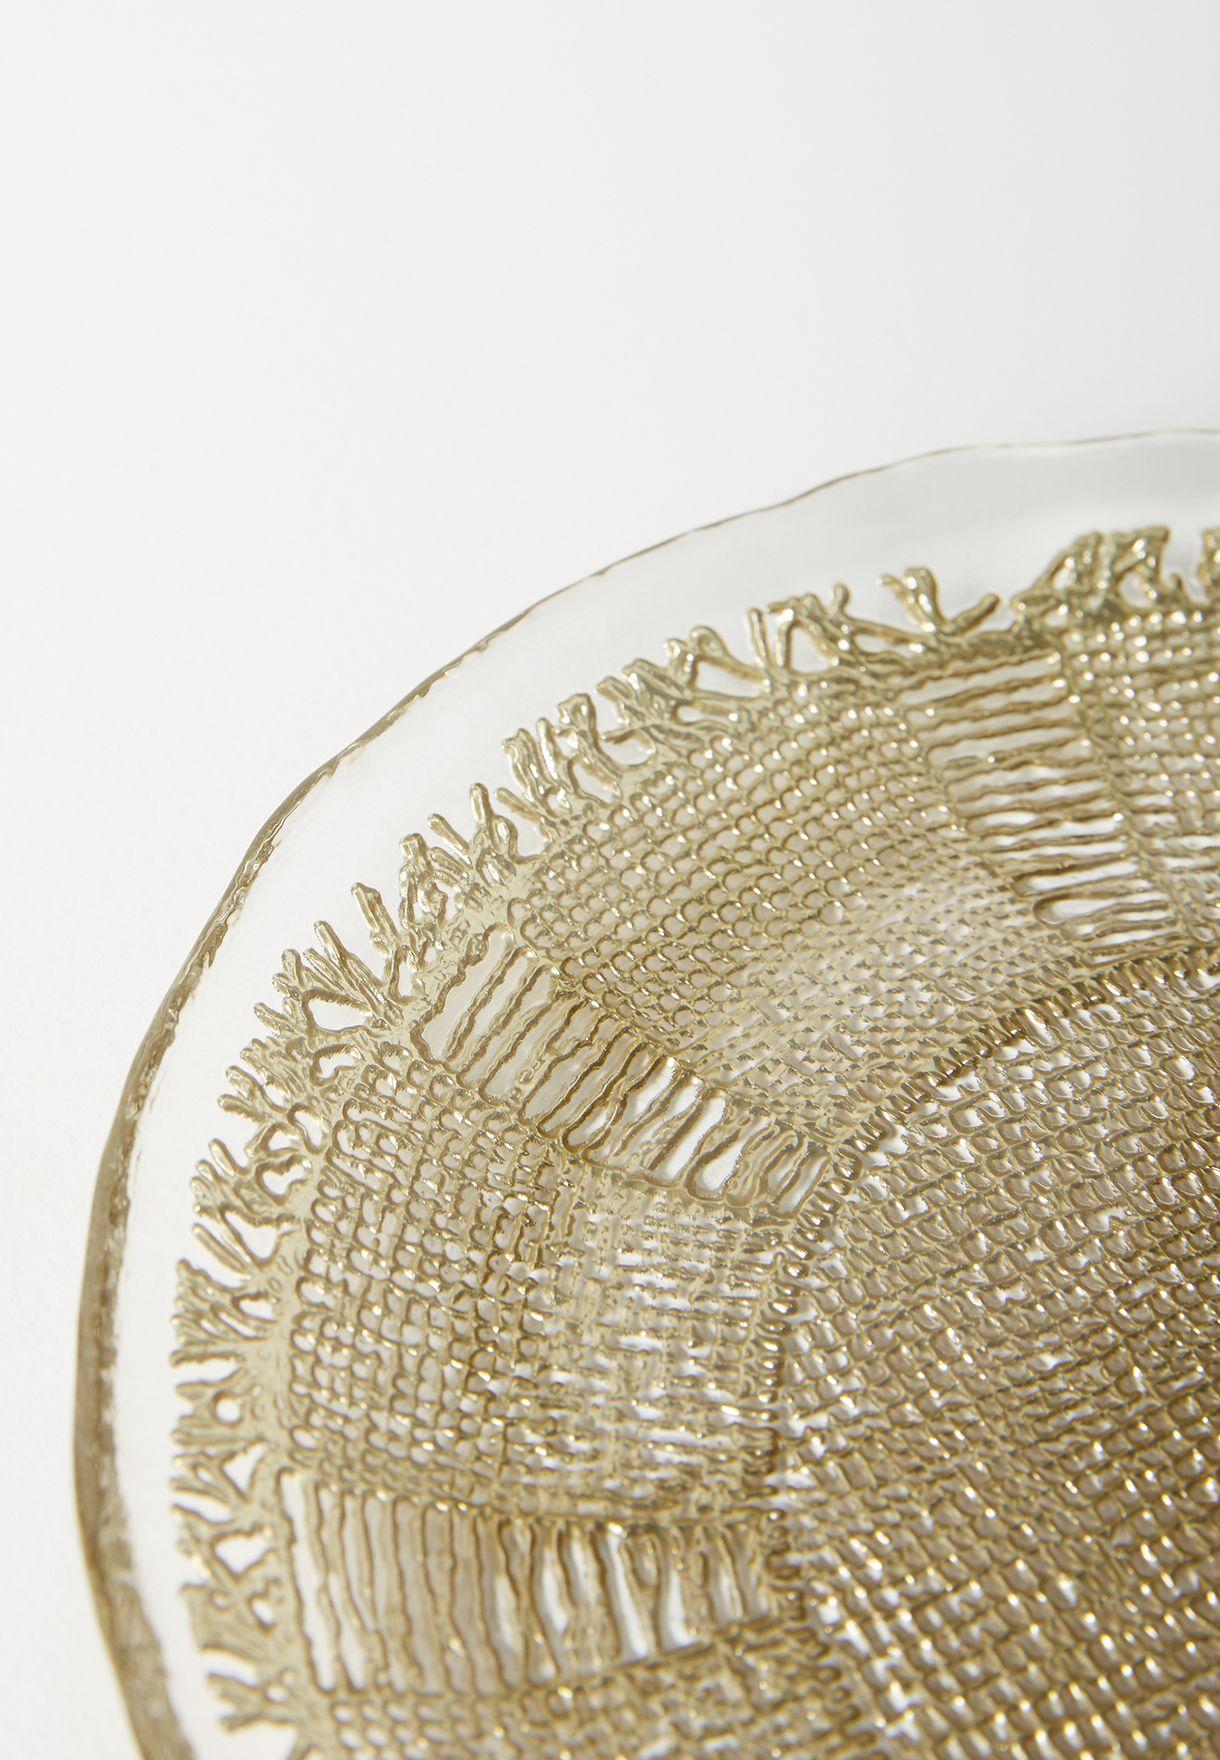 Sarah Side Plate